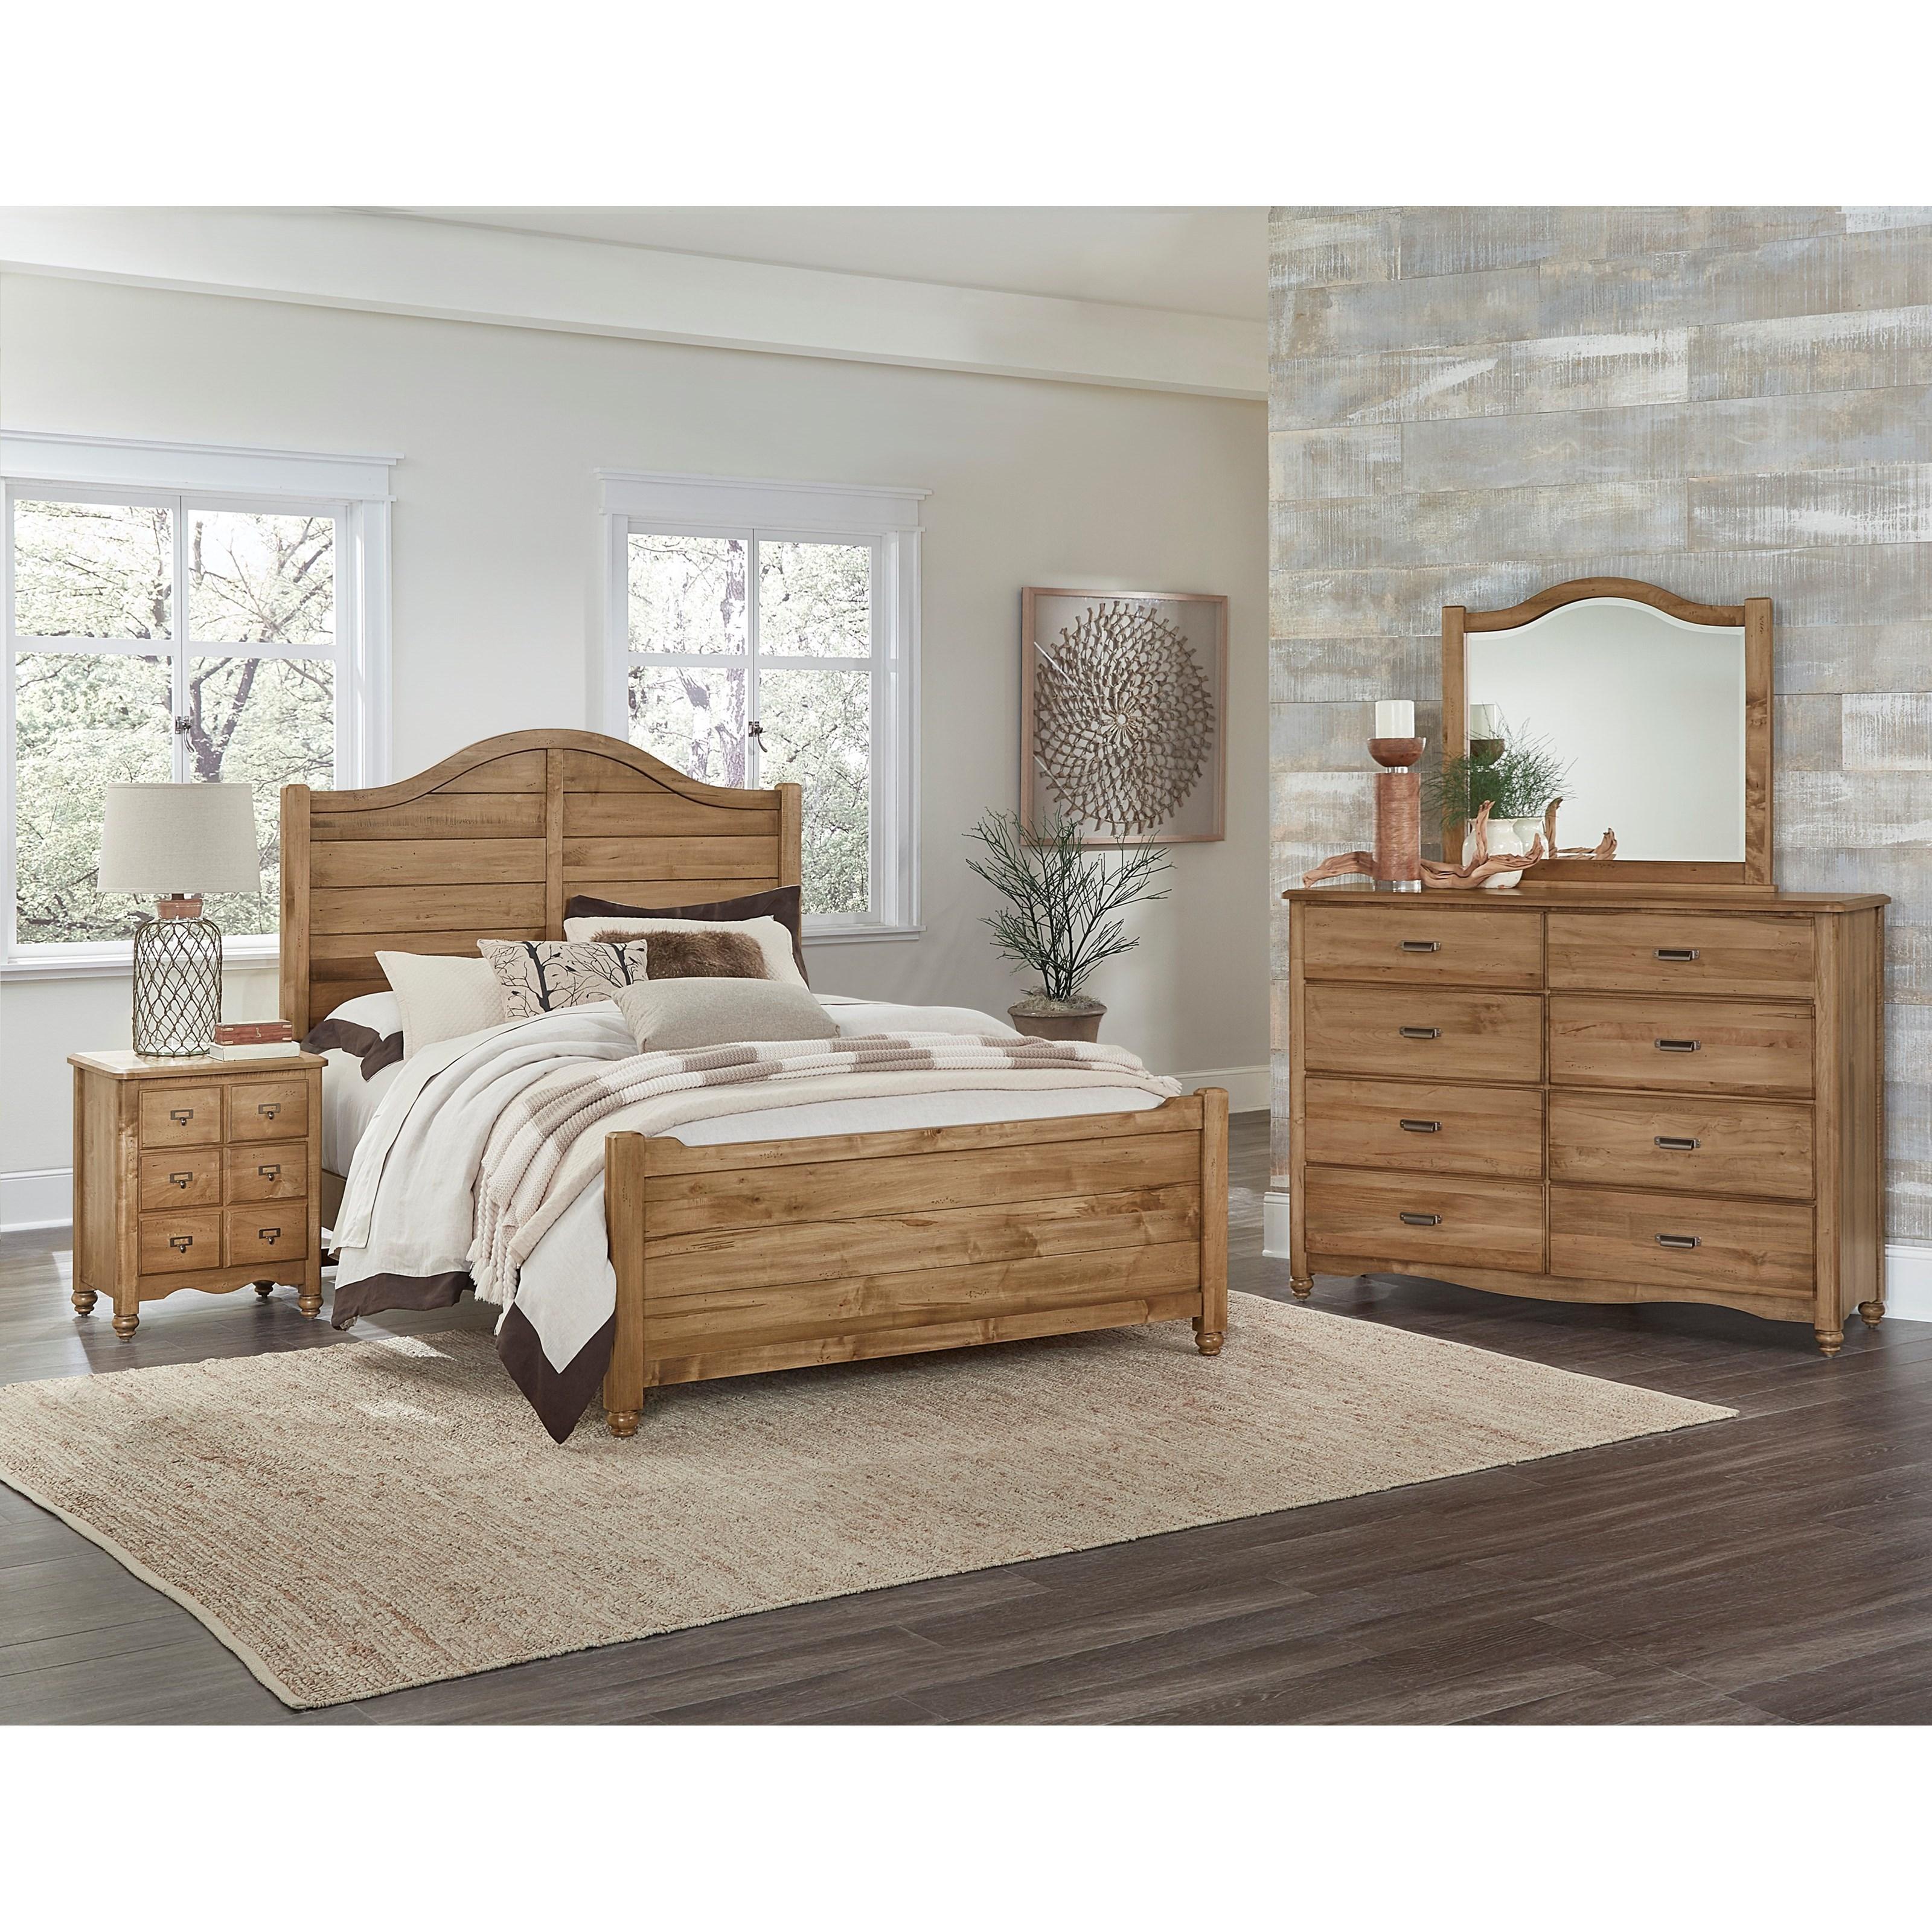 Vaughan Bassett Maple Escape King Bedroom Group - Item Number: 402 K Bedroom Group 2